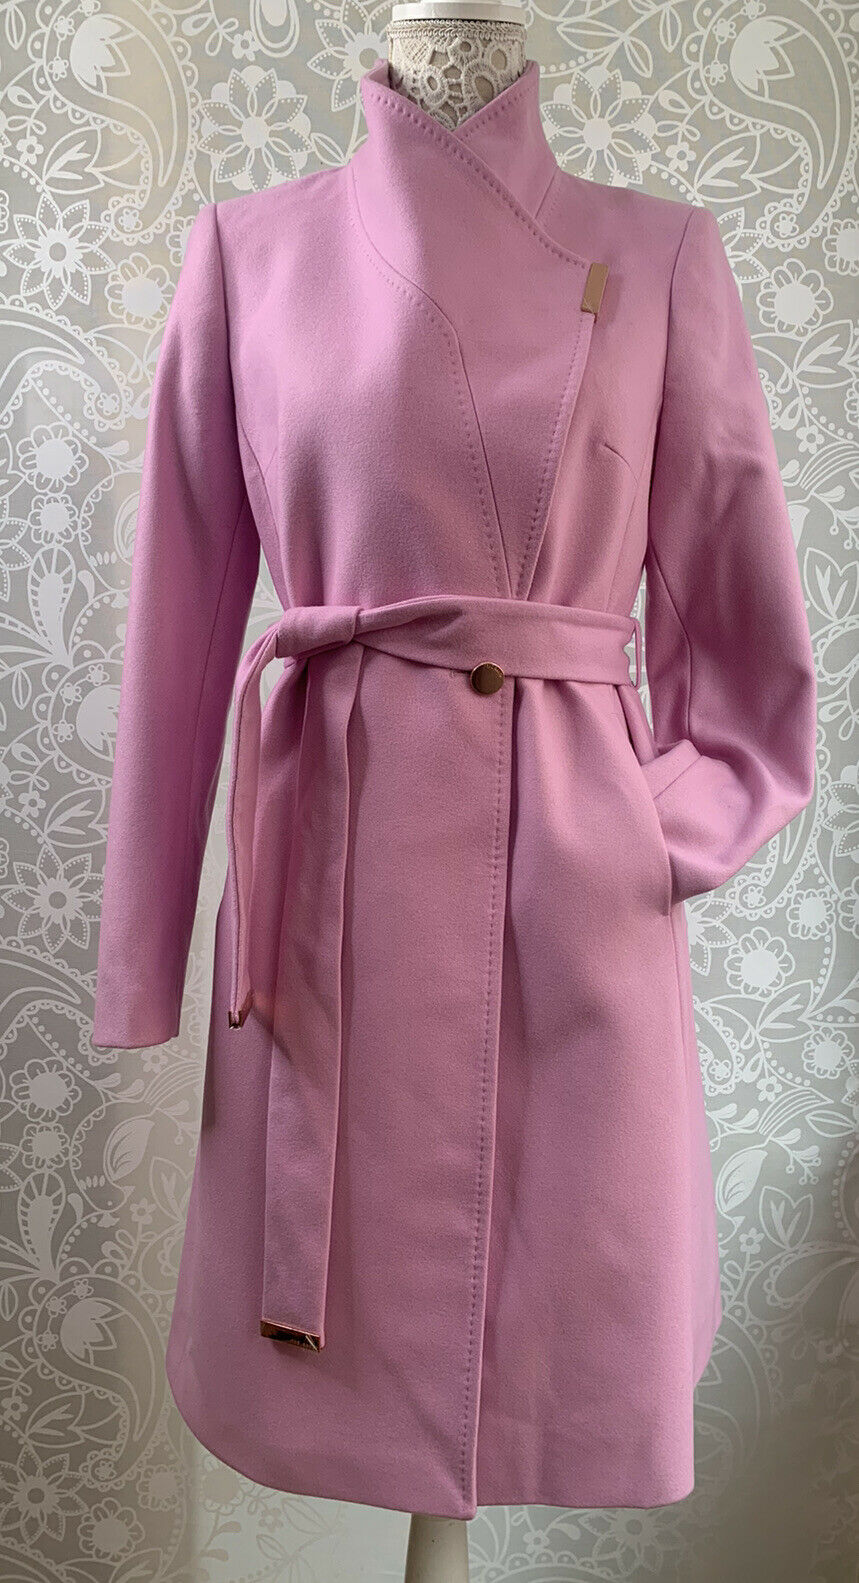 Ted Baker Coat Rose pink cashmere wool blend wrap SIZE 2 UK 10